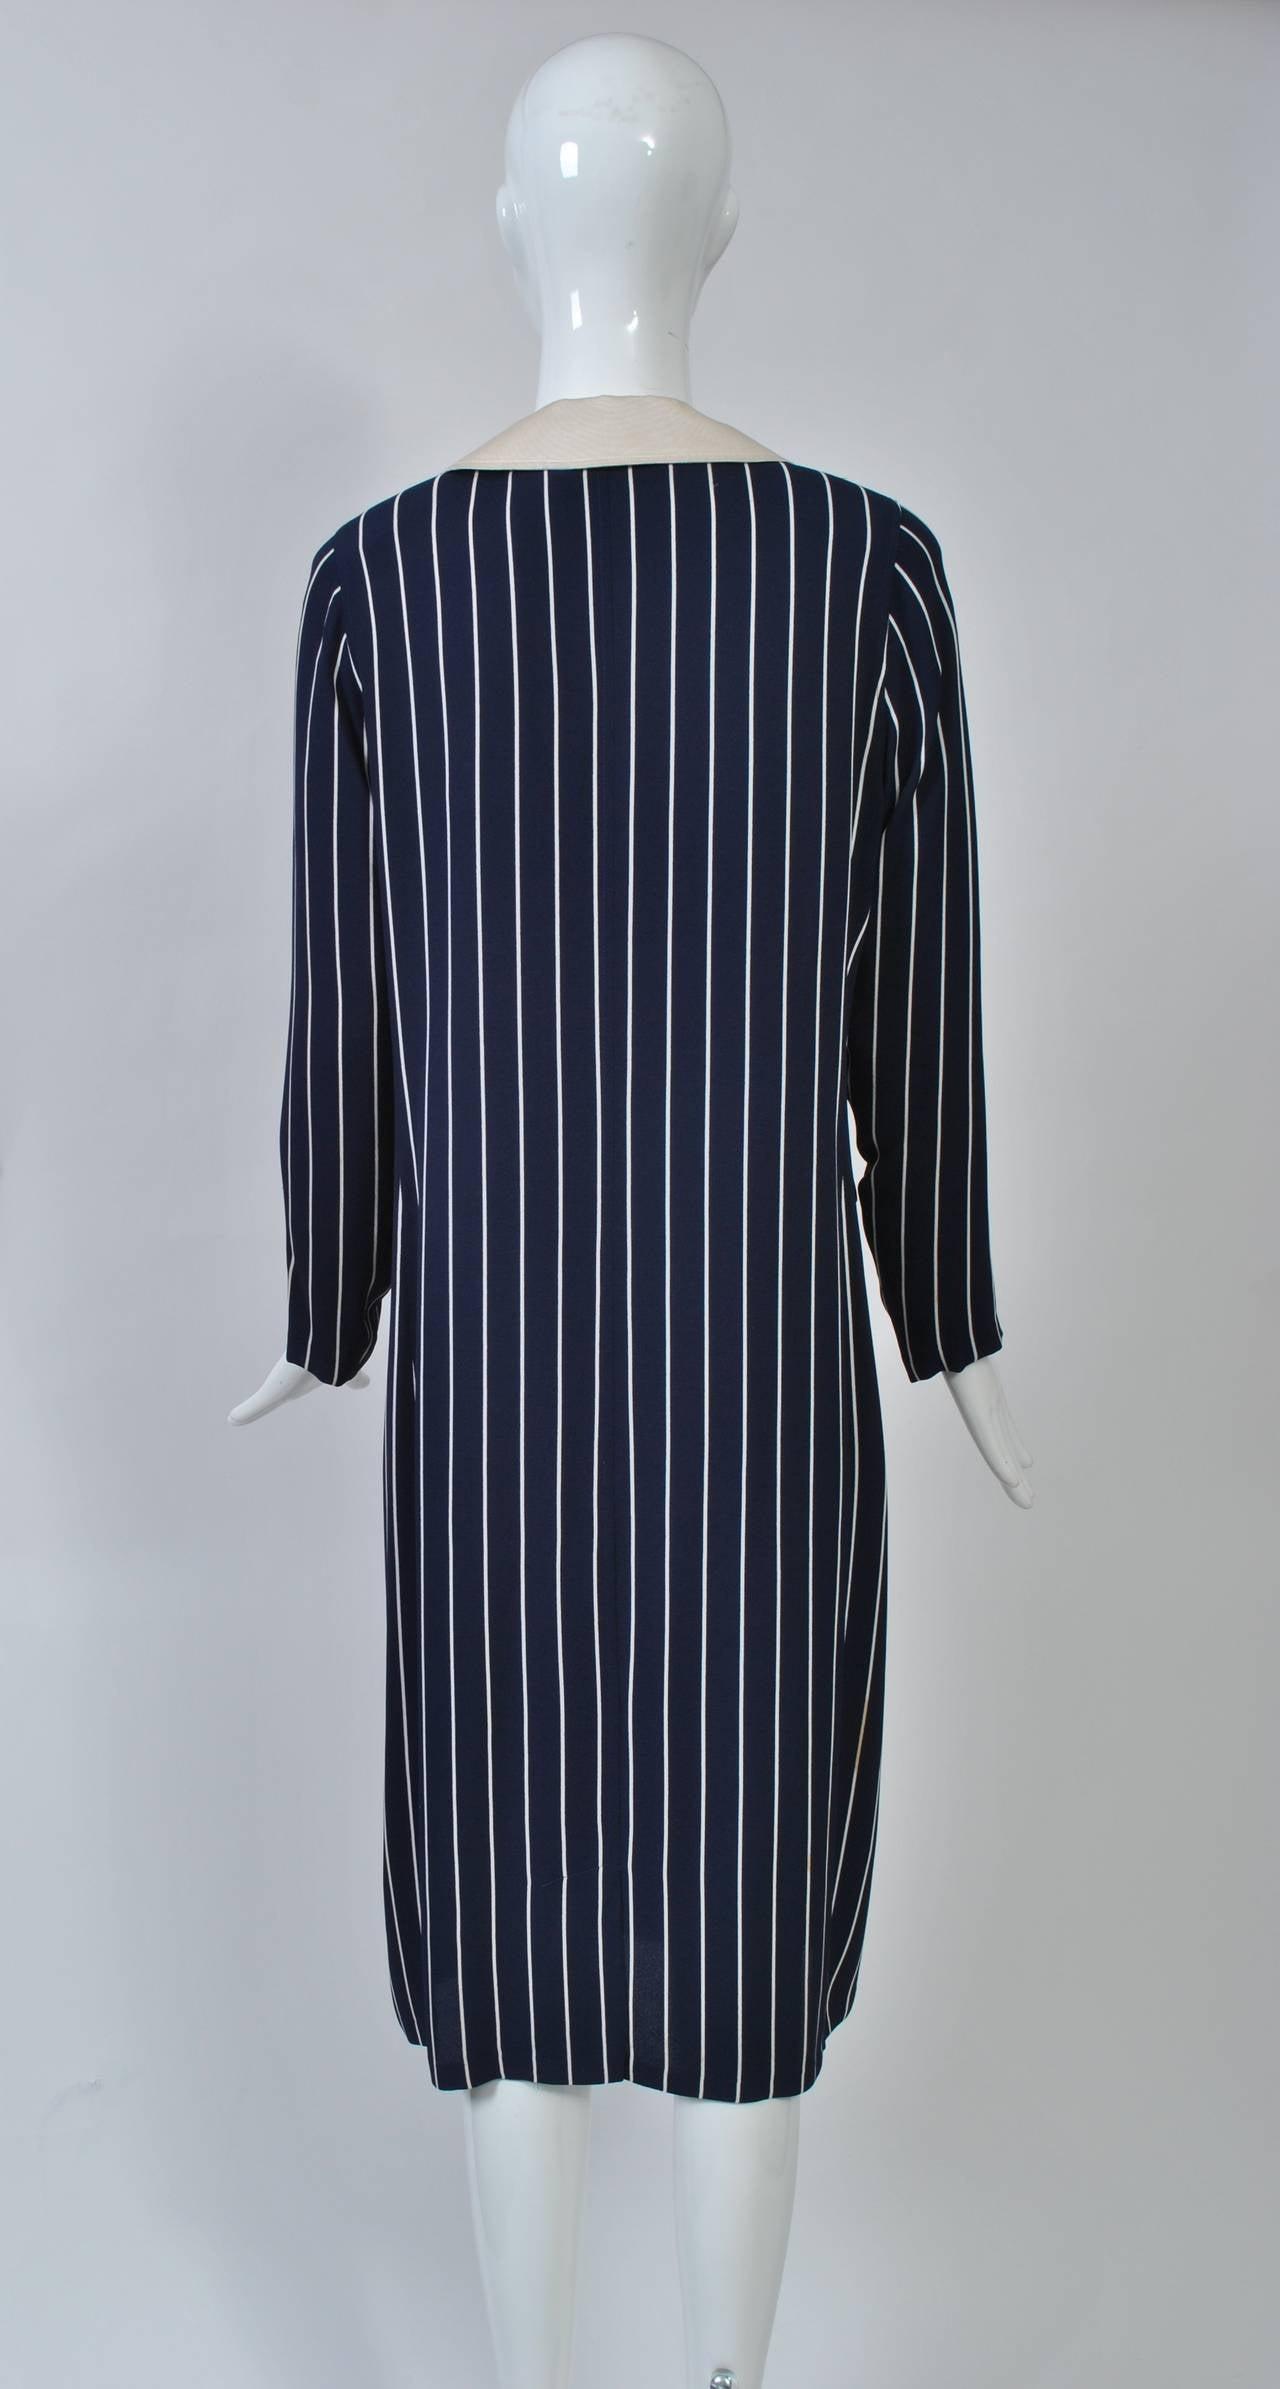 Adolfo Pinstripe Shirtdress 4